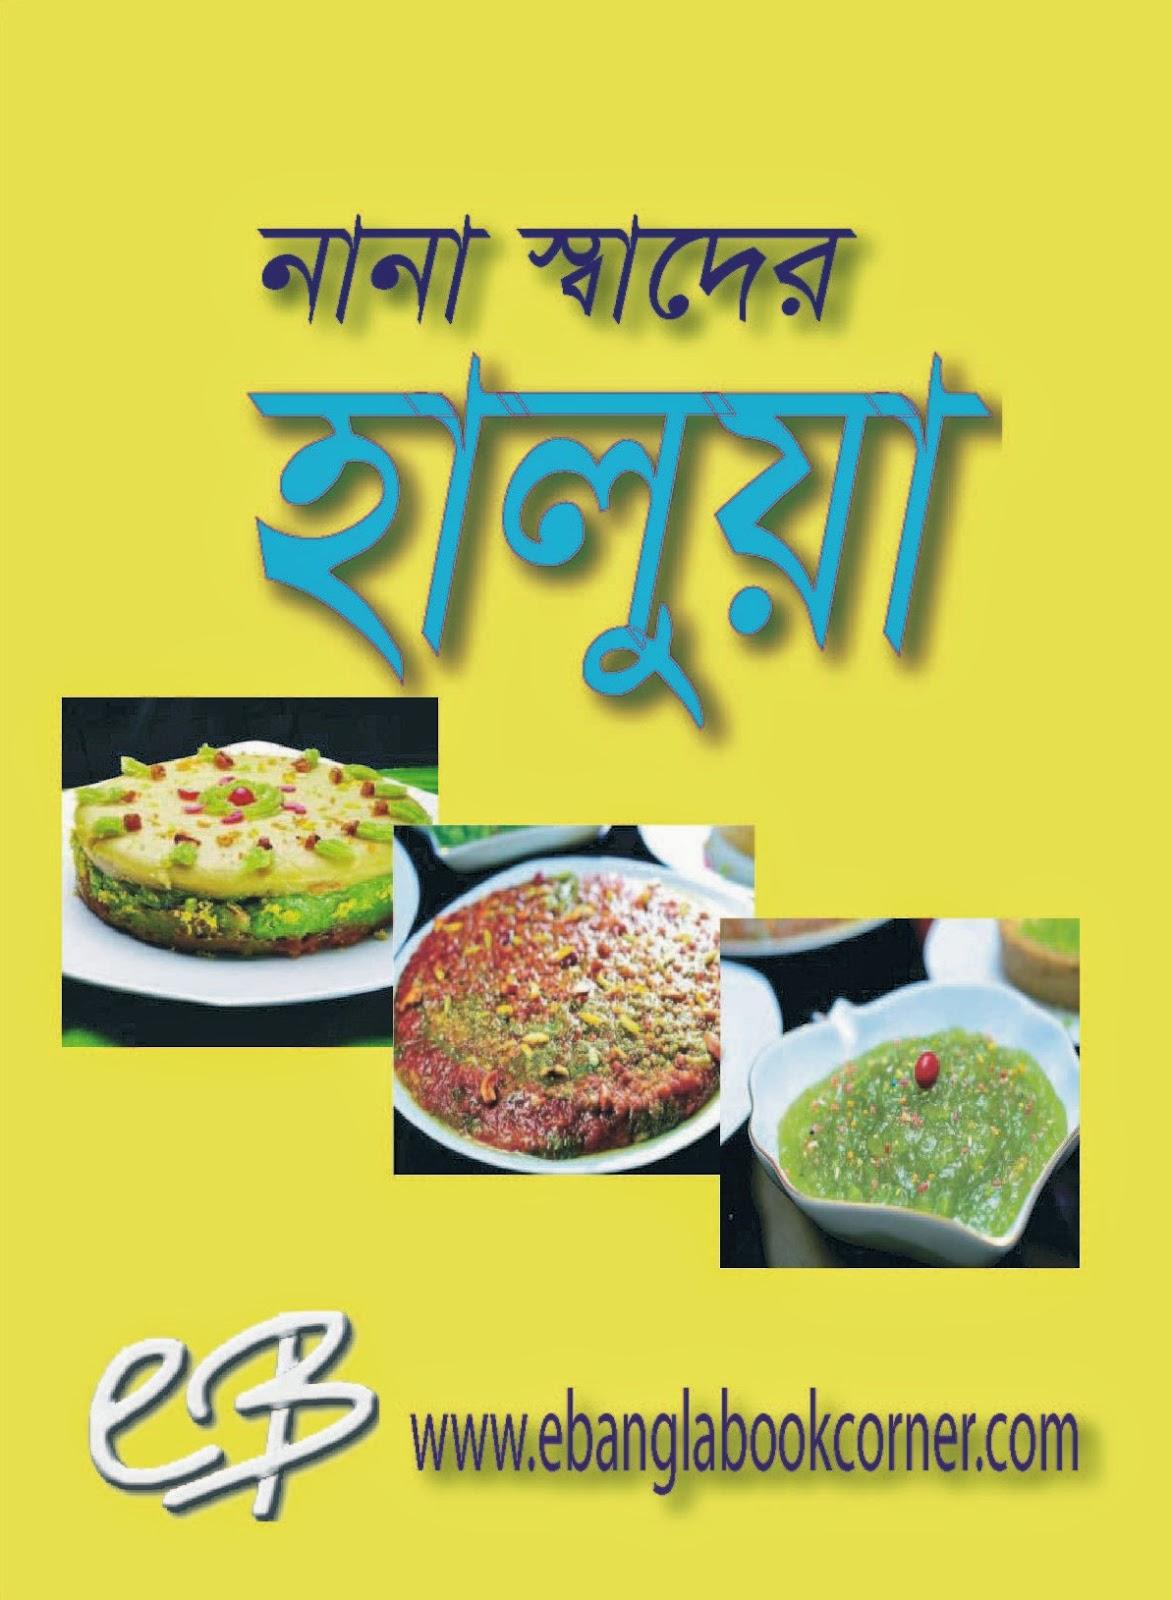 Bangla e books free downloaddownload pdf ebooks all types august bengali recipe book nana swader haluya pdf download forumfinder Choice Image